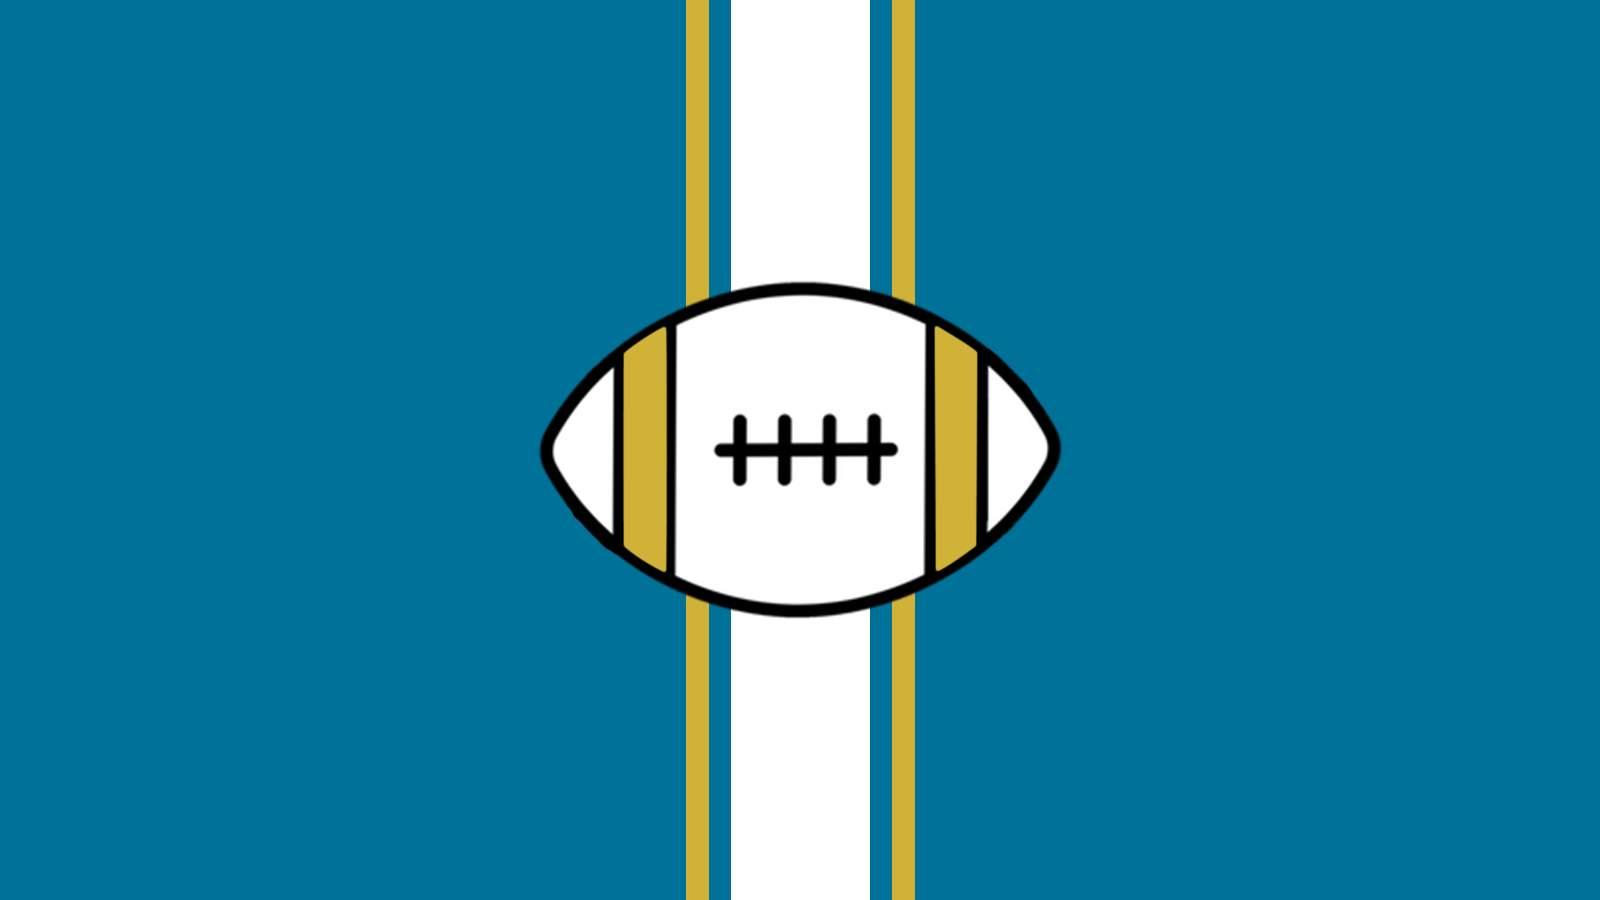 Pittsburgh Steelers at Jacksonville Jaguars (Reduced Capacity, Social Distancing)